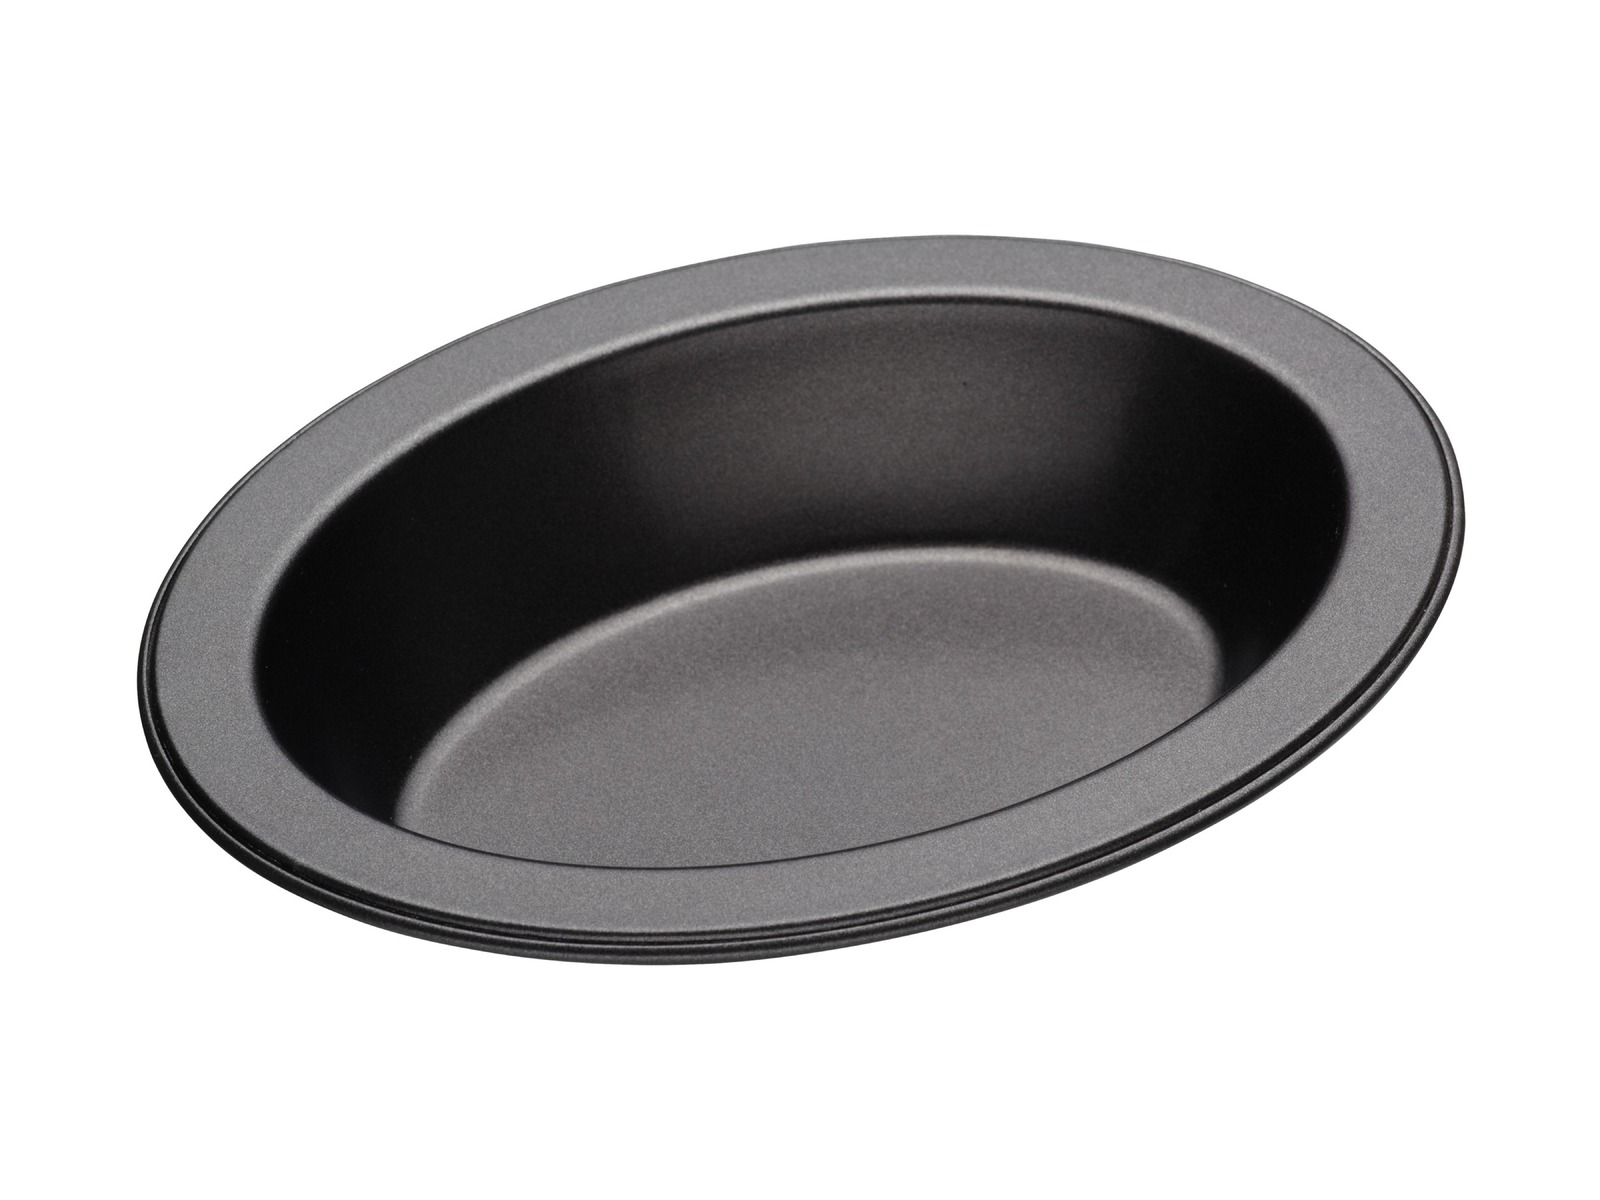 MasterClass: Non-Stick Individual Oval Pie Dish (13cm) image